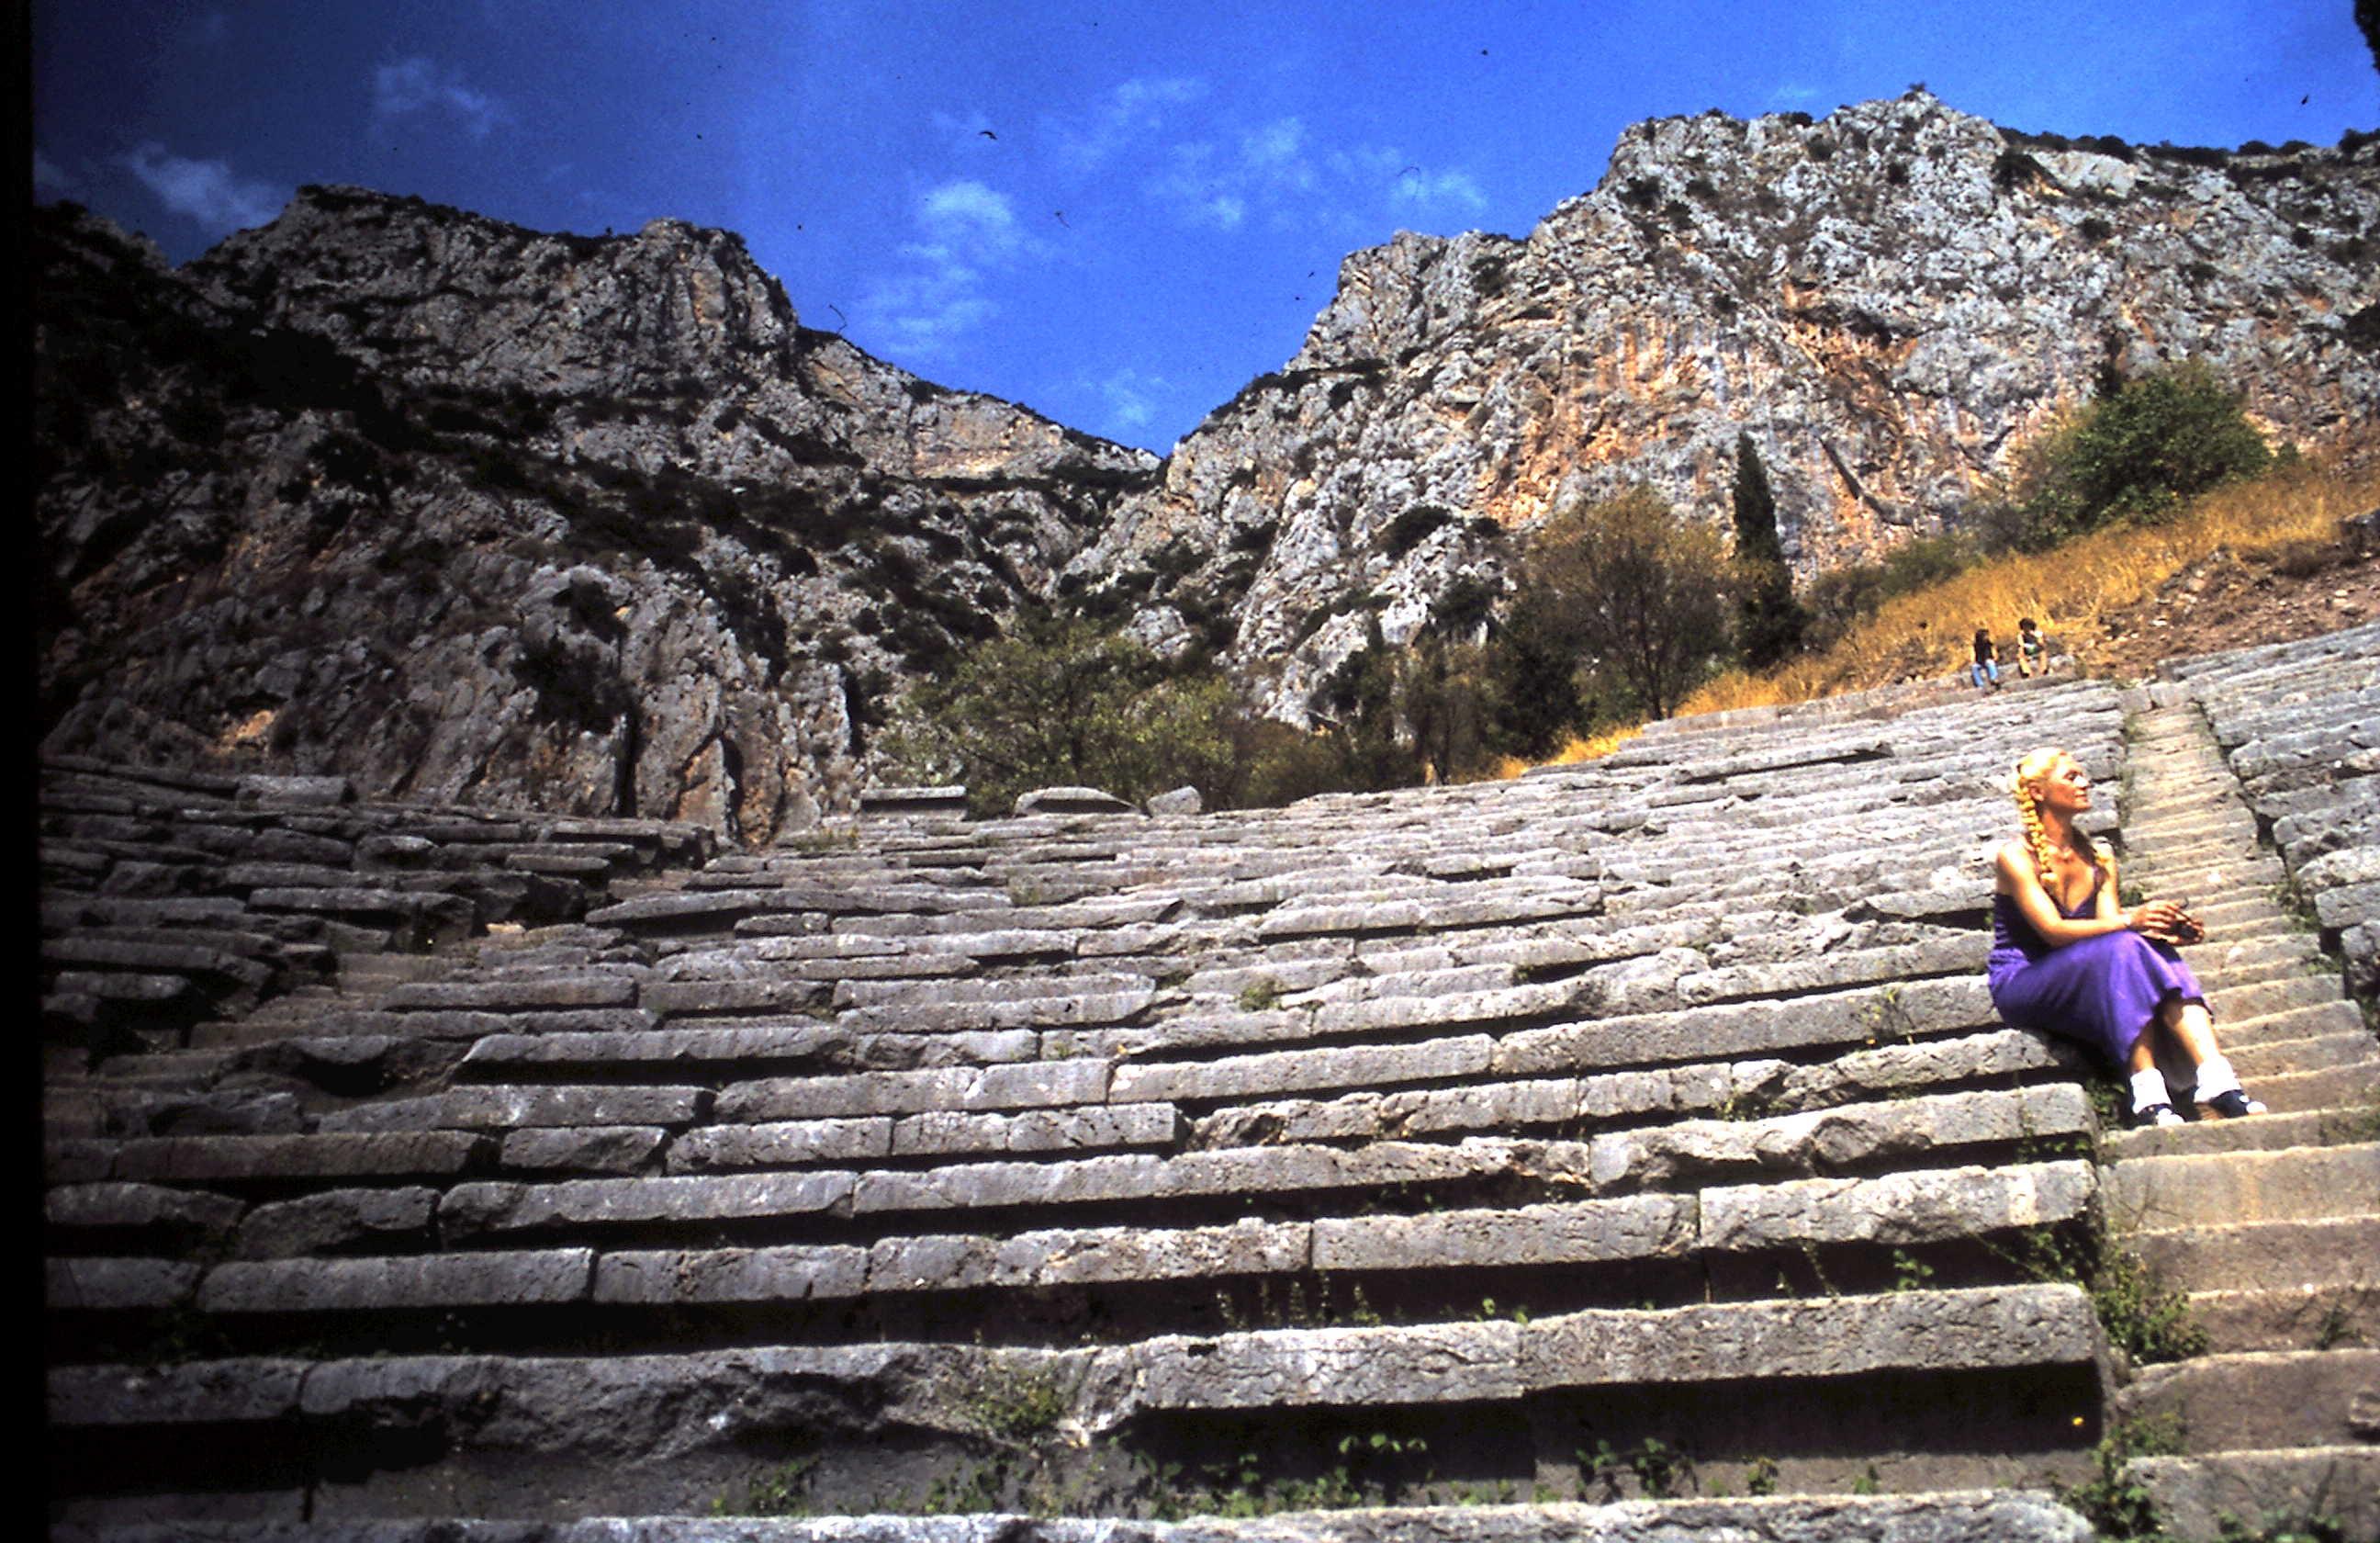 1979-09-26 Delphi HCC im amphitheater